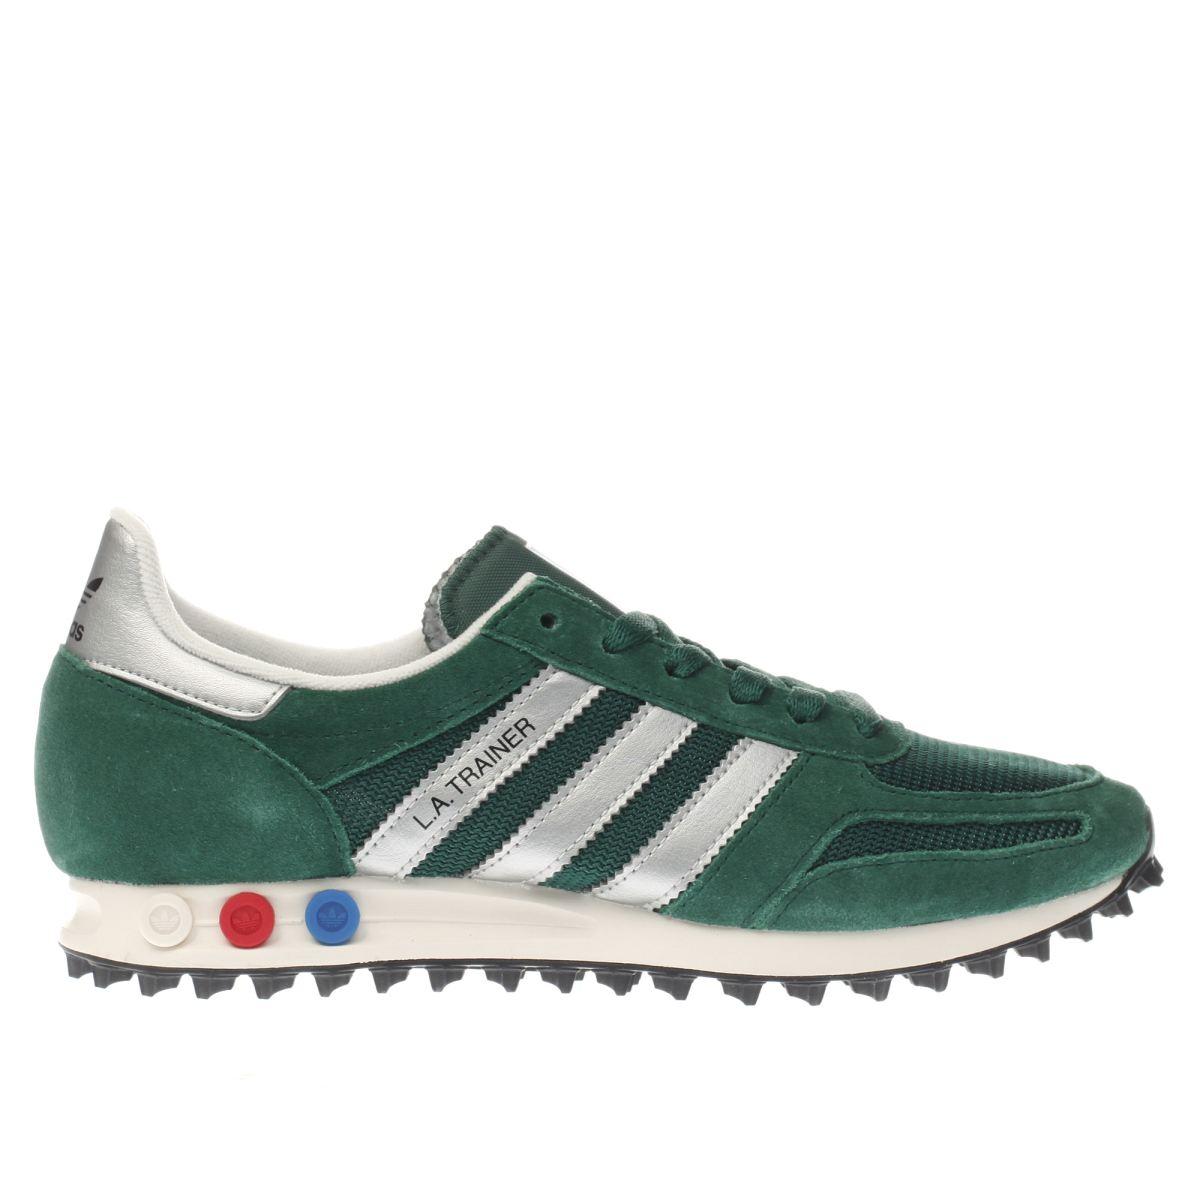 adidas green la trainer og trainers